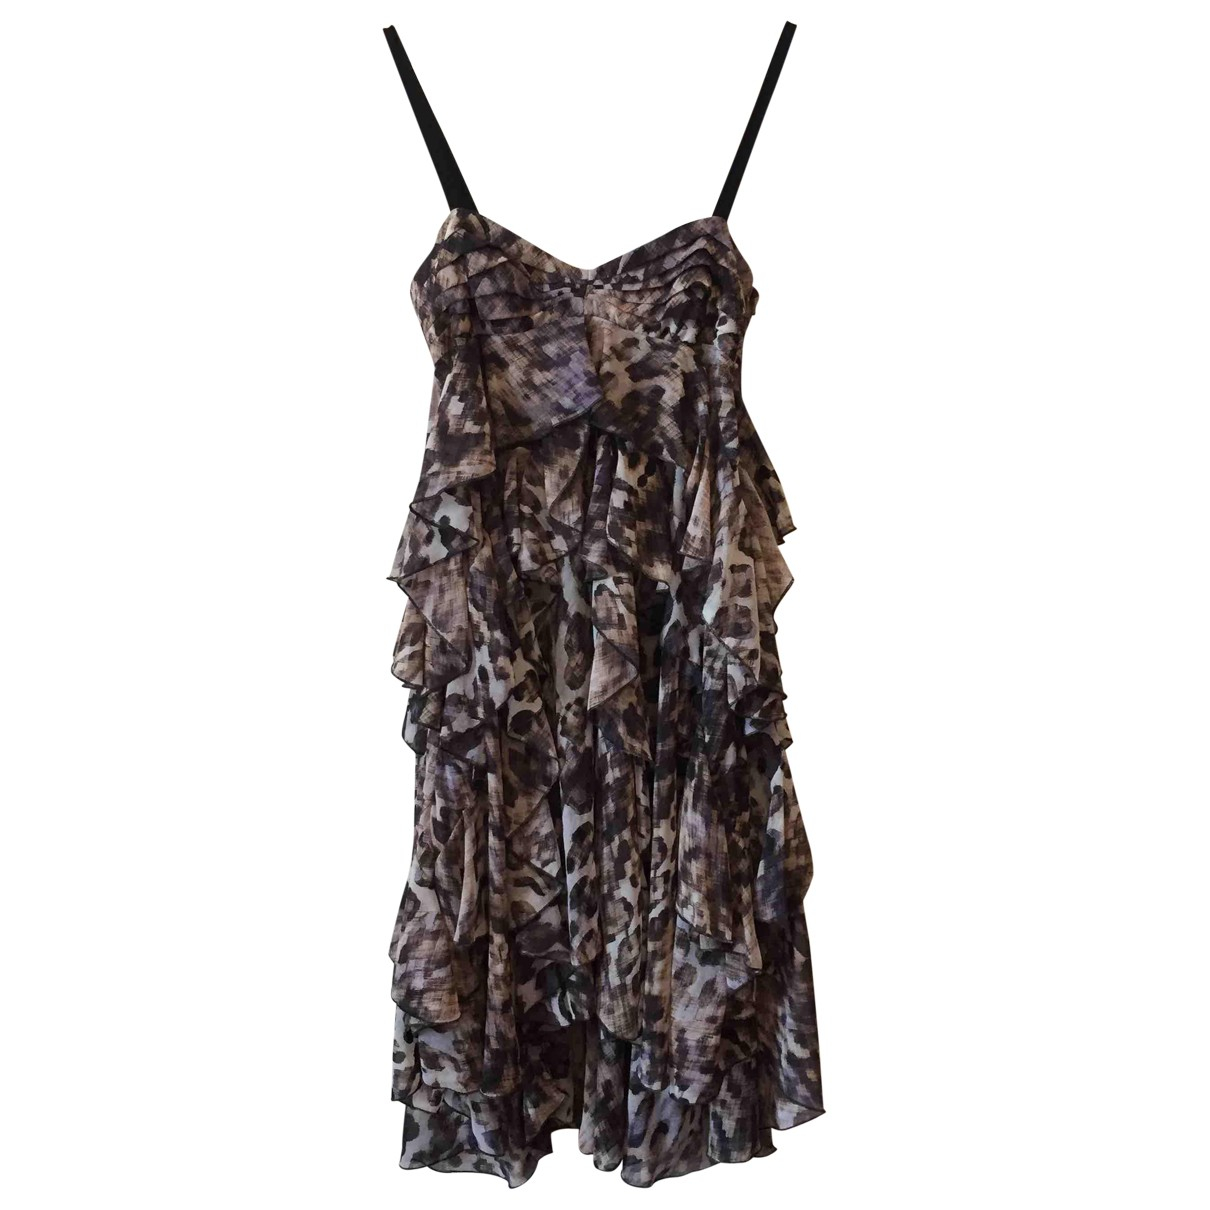 H&m Studio N Multicolour dress for Women 36 IT